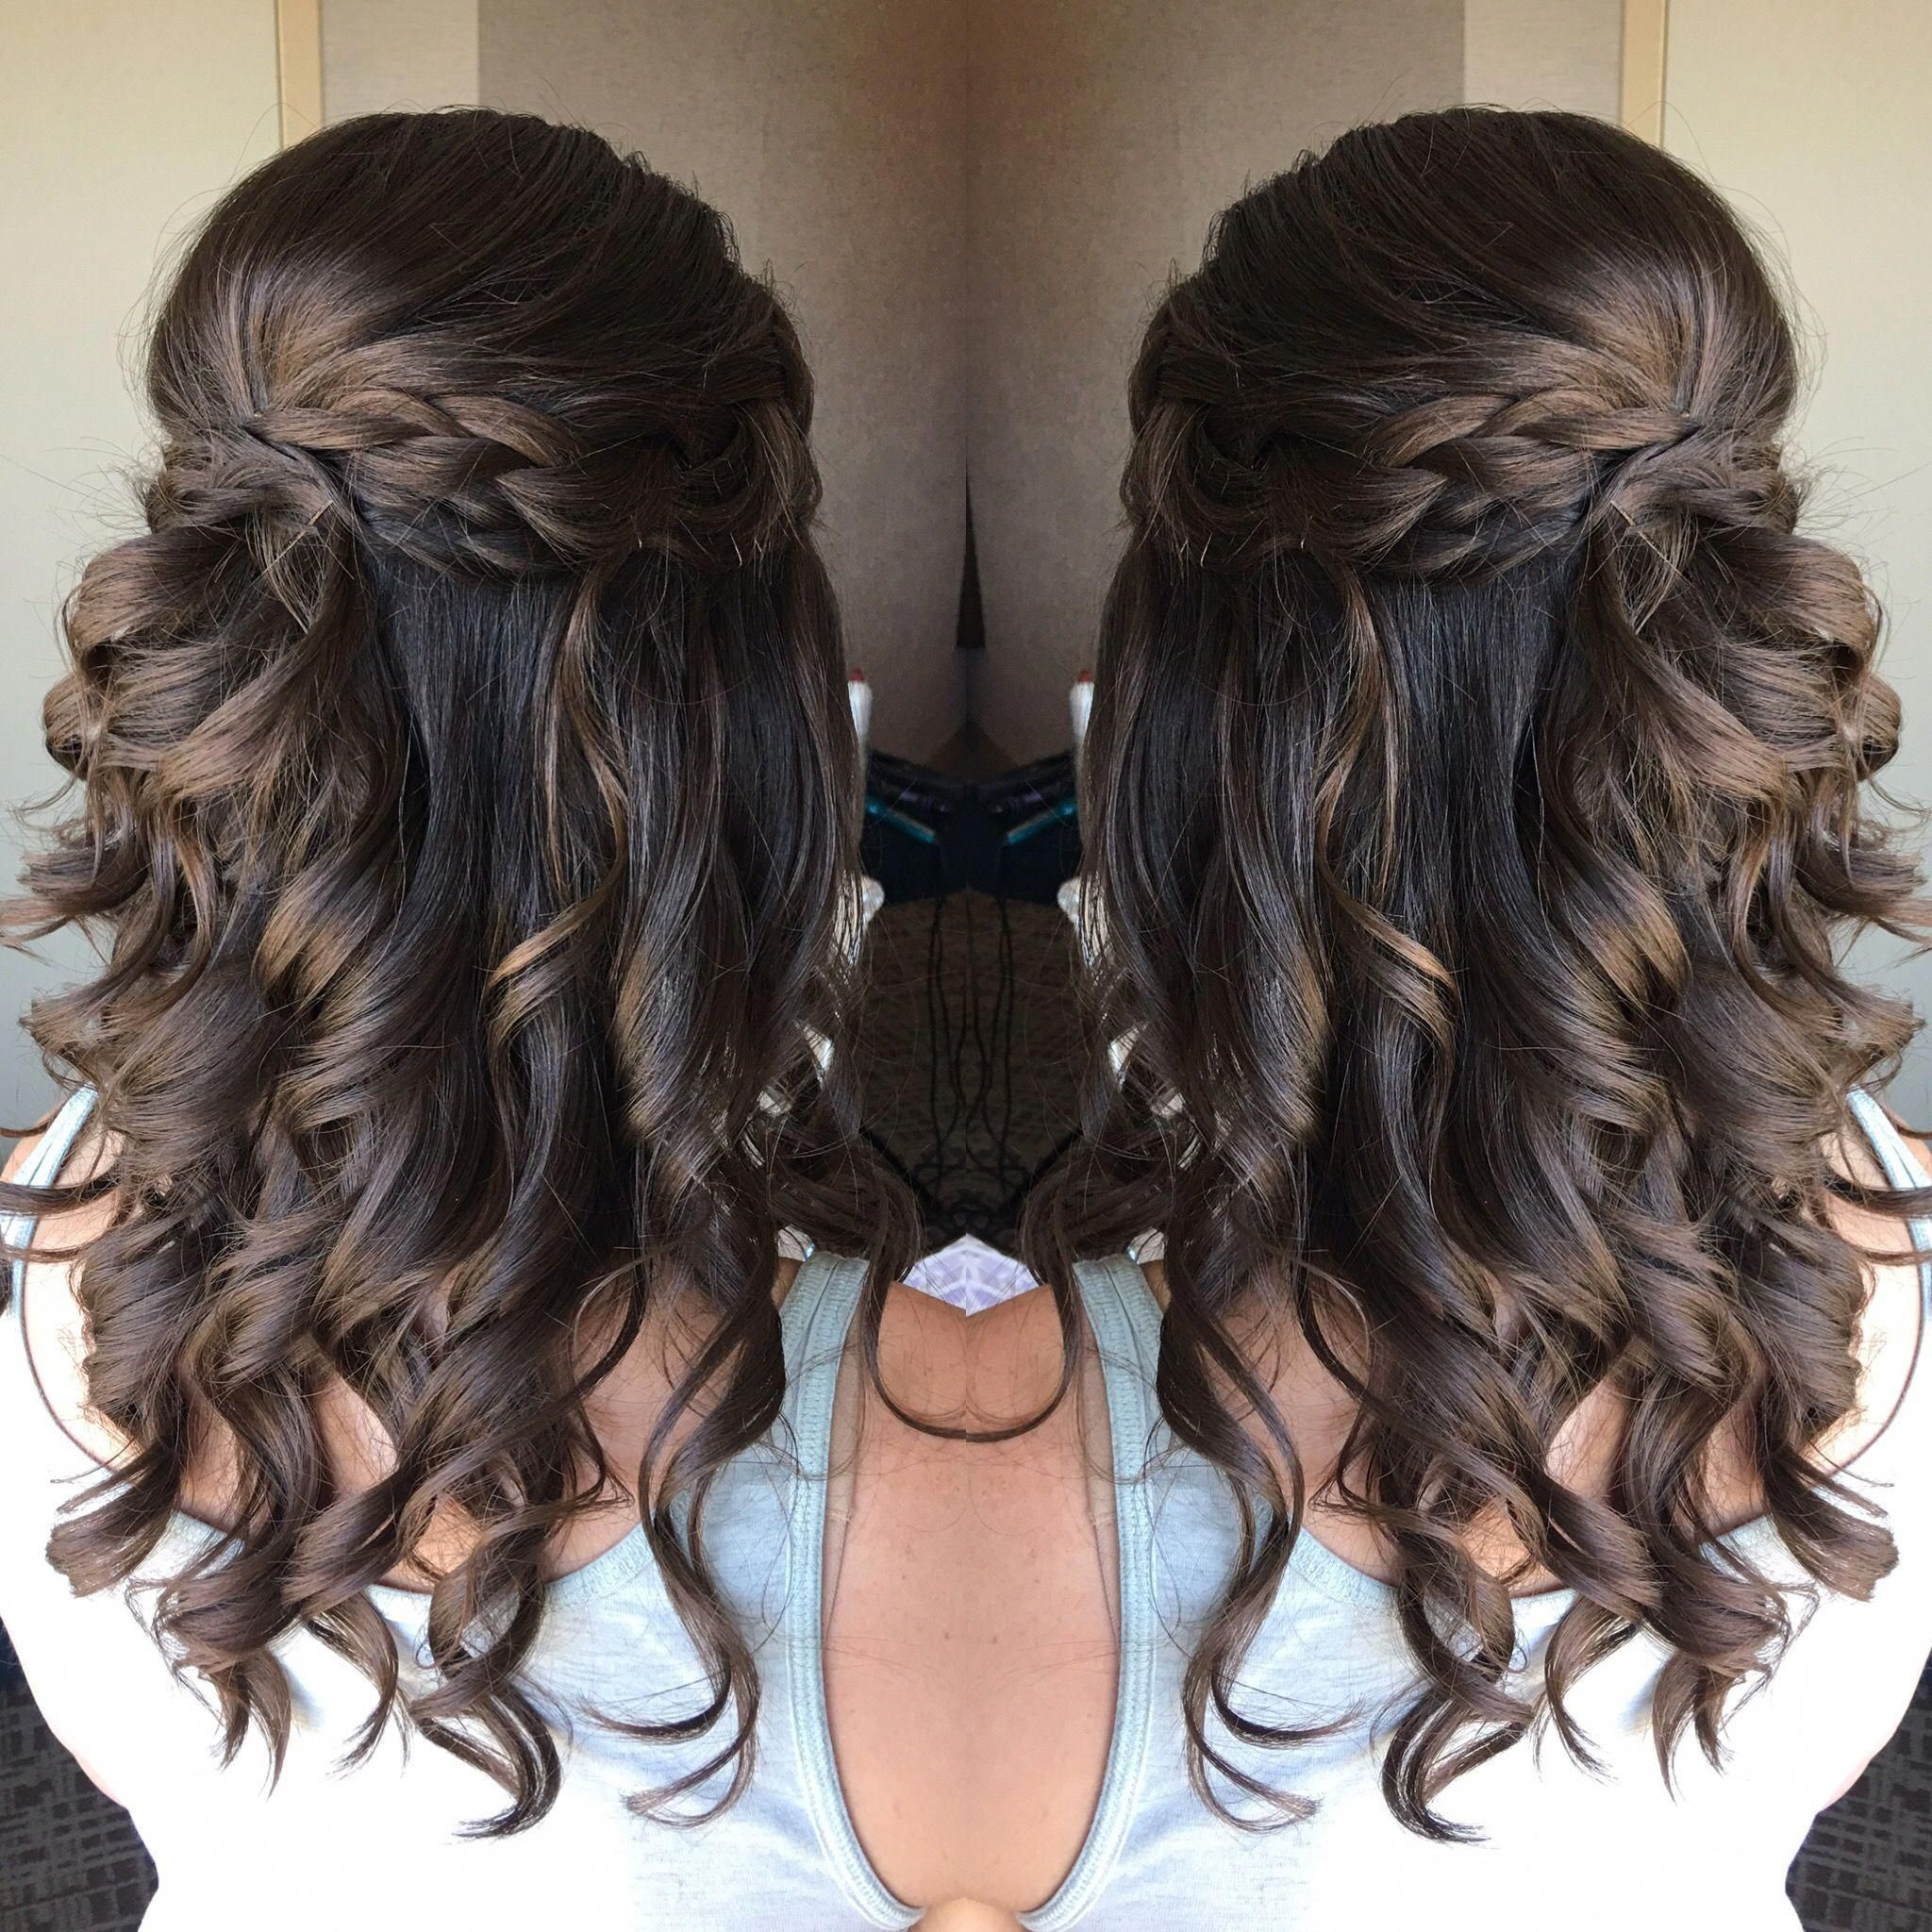 braided half up half down wedding hairstyle | great looking